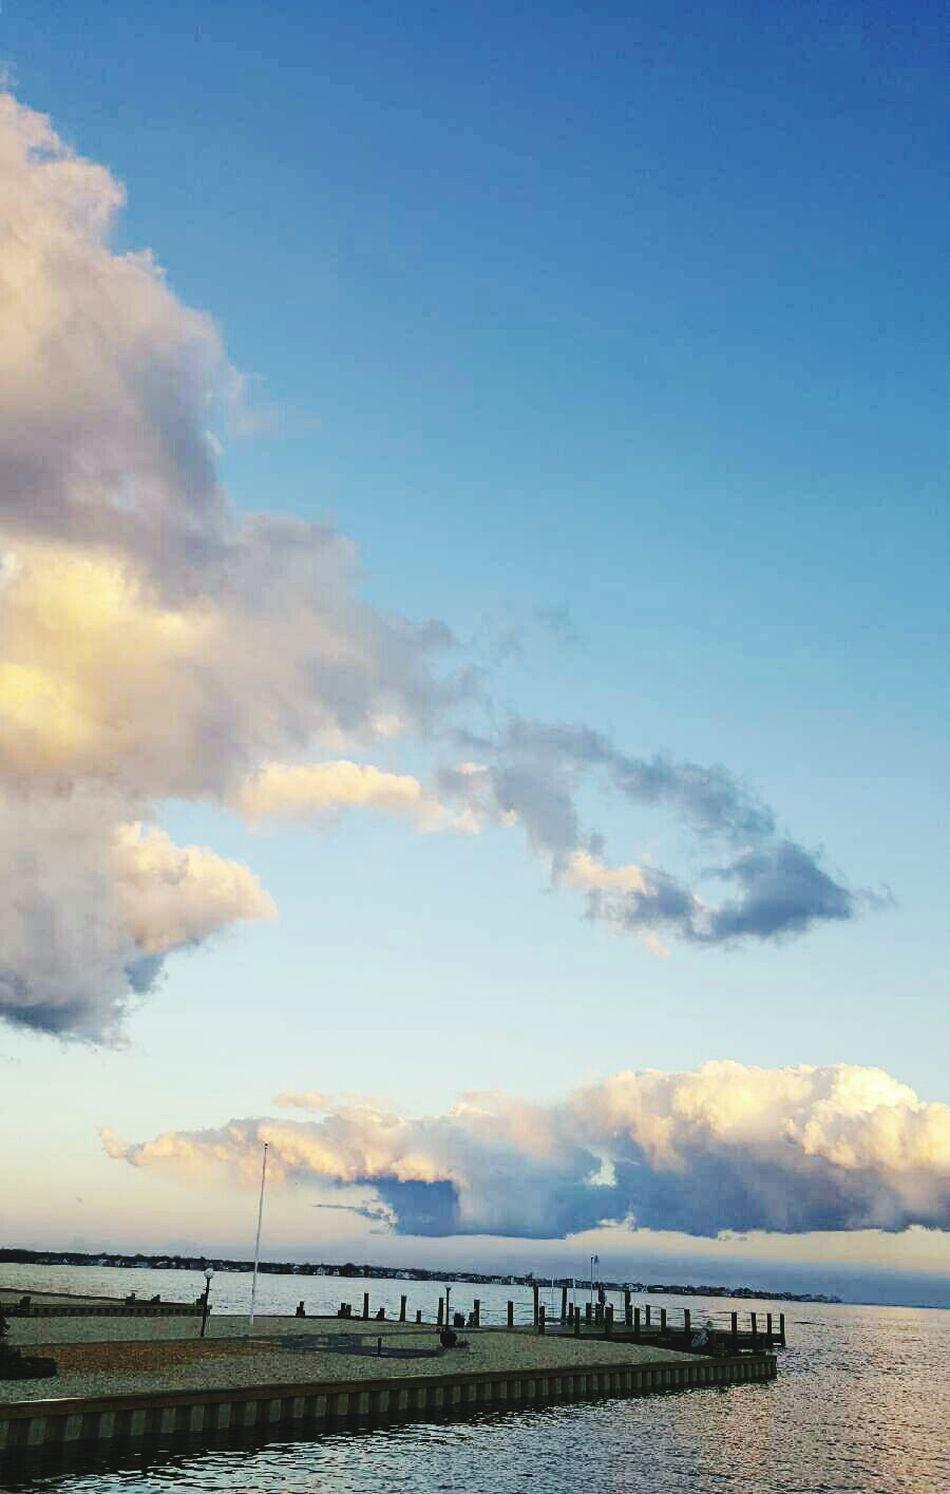 Eyeem Jersey Shore Mantolooking New Jersey Photography EyeEm Sunsets Jersey Shore EyeEm Gallery EyeEmBestPics Eyeem Sunset-sunrise Eyemphotography Sunset Taking Photos Clouds Clouds And Sky Storm Clouds Cloudscape Cloud